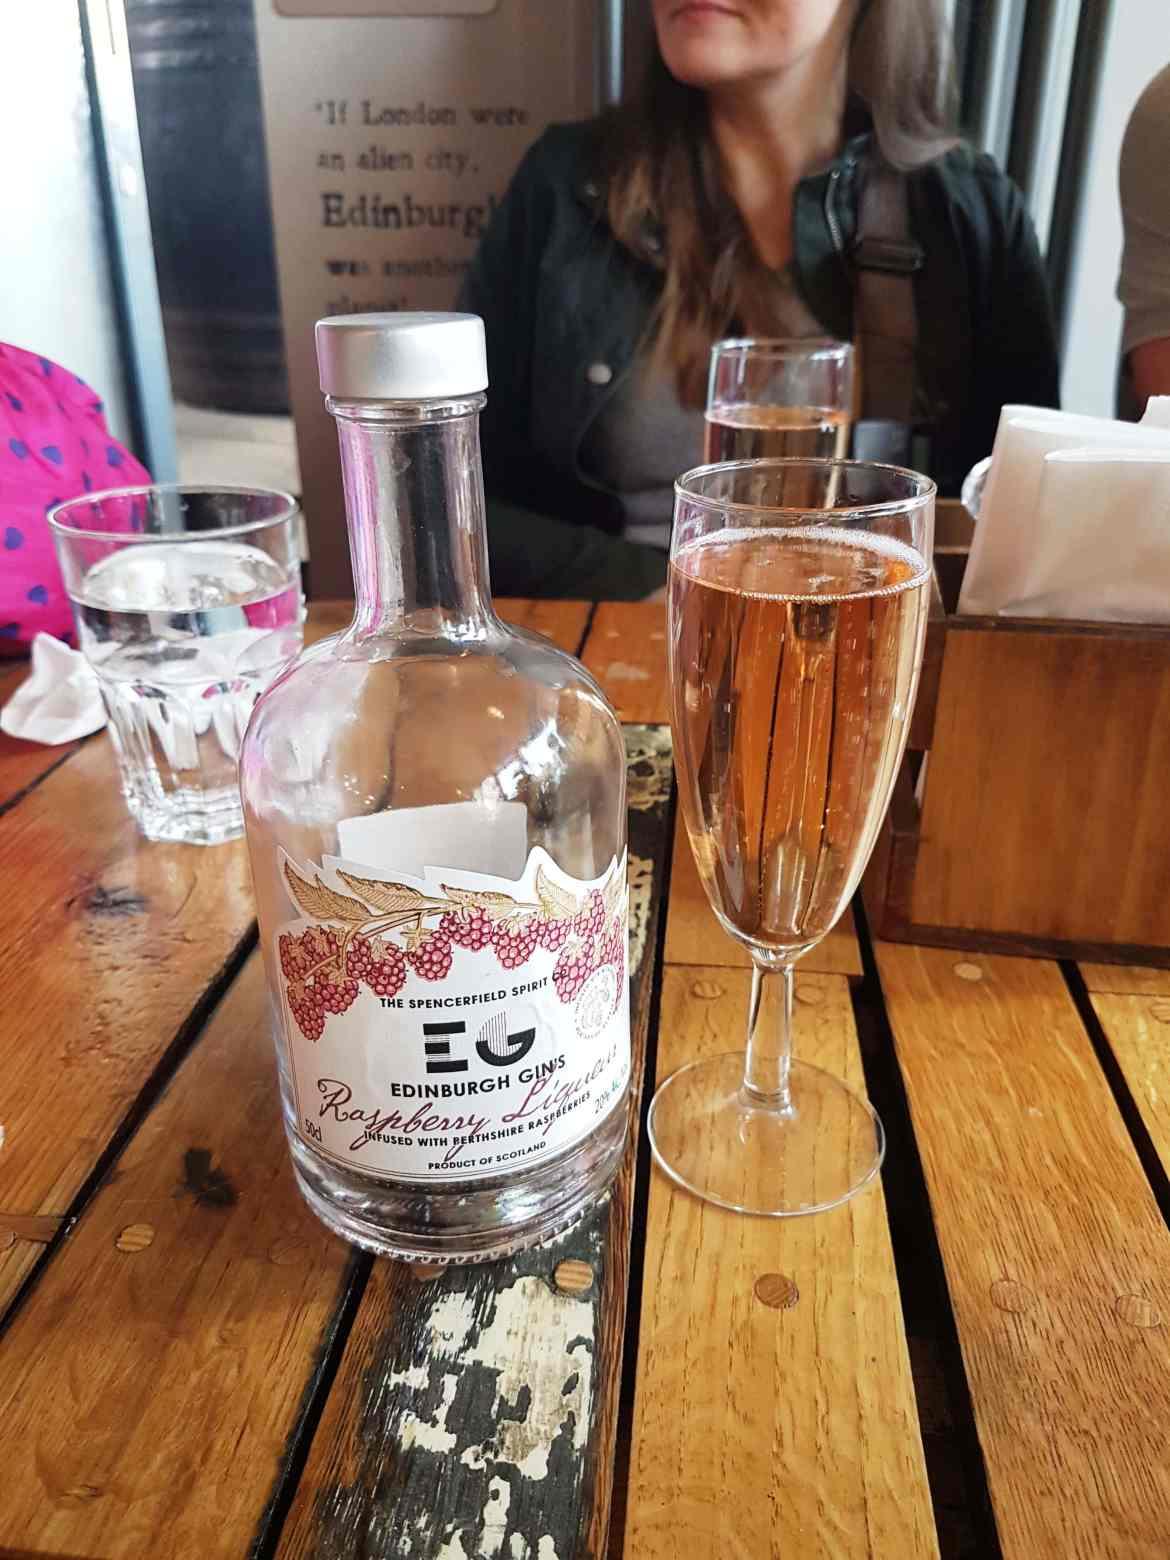 fromthecornertable, from the corner table, edinburgh gin, food tour, food walk, edinburgh, scotland food